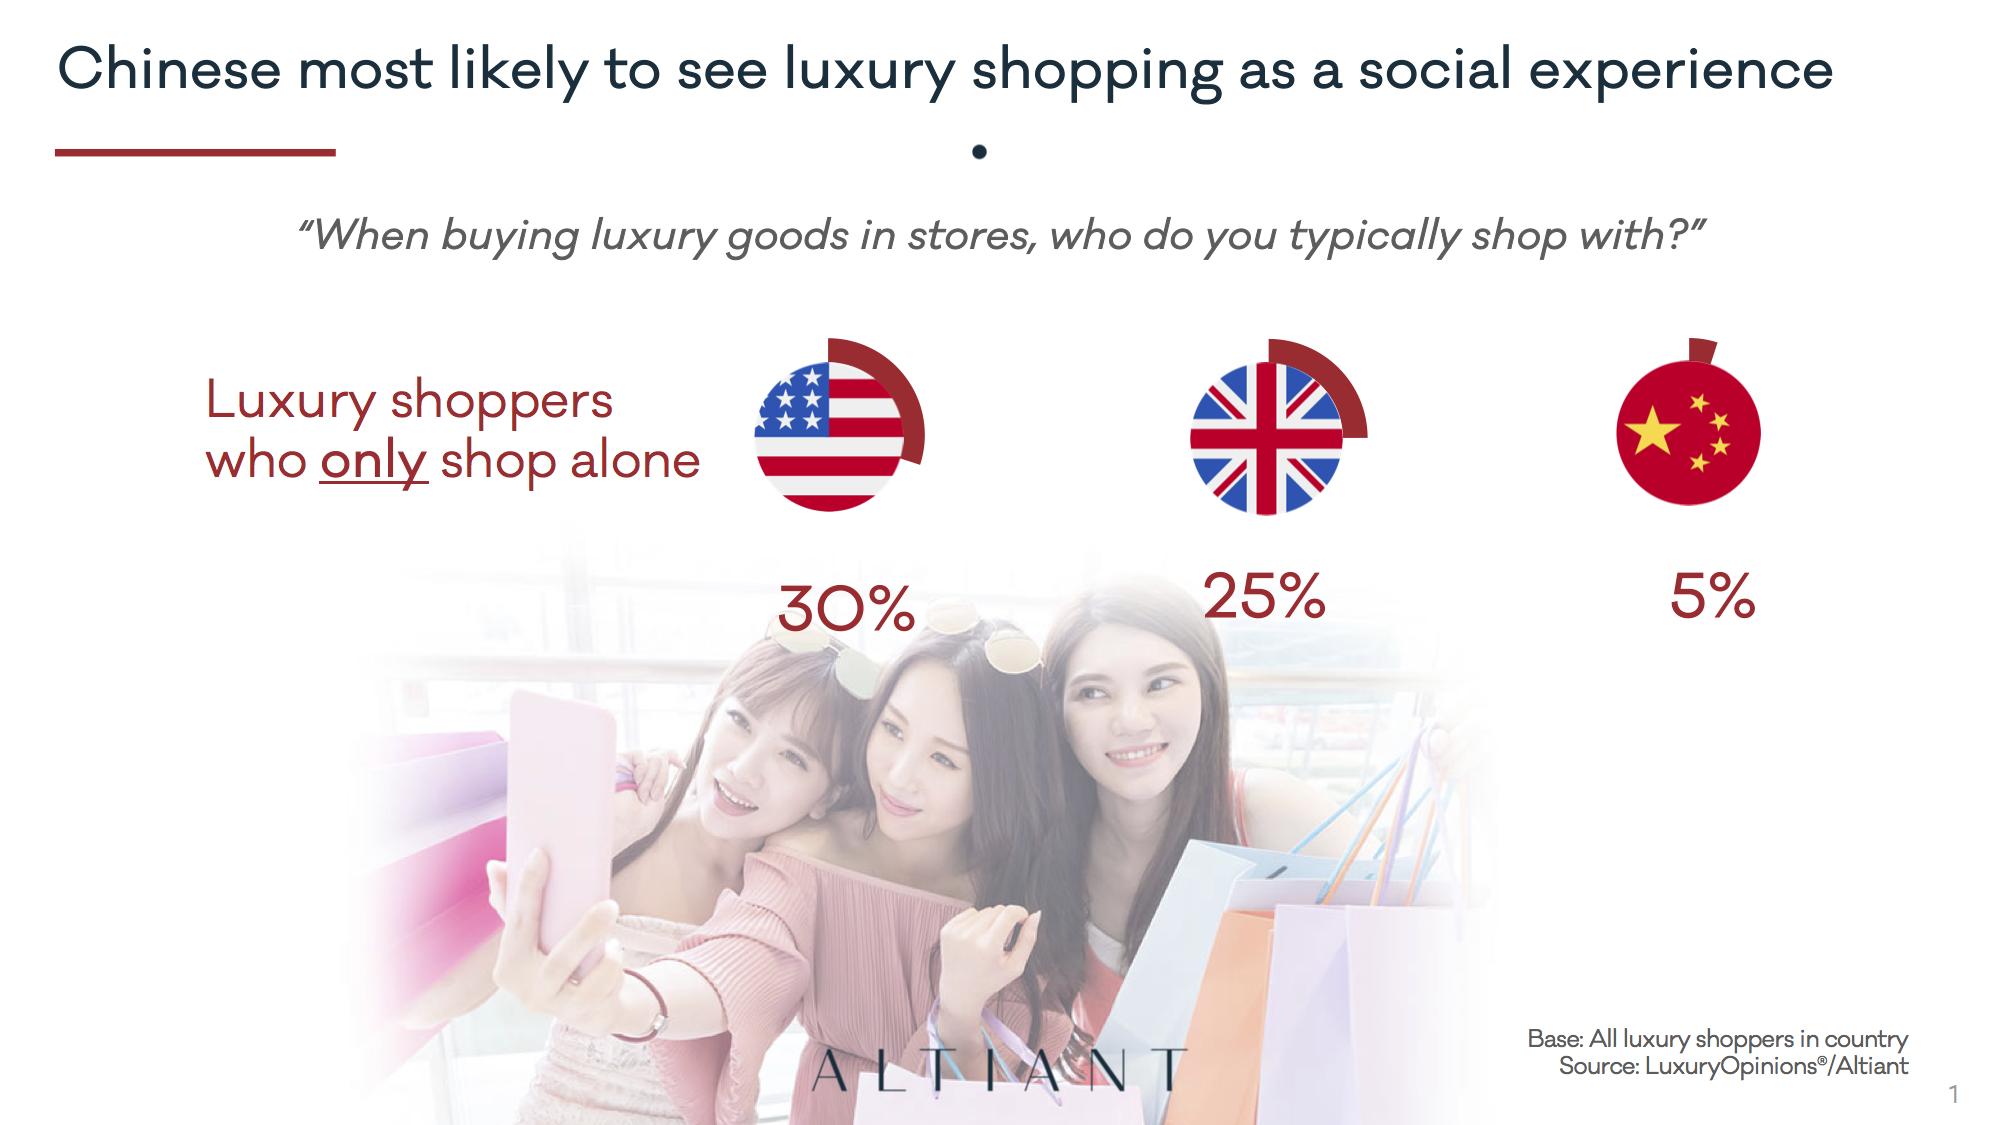 Altiant Key Luxury Trends p5 copy.png